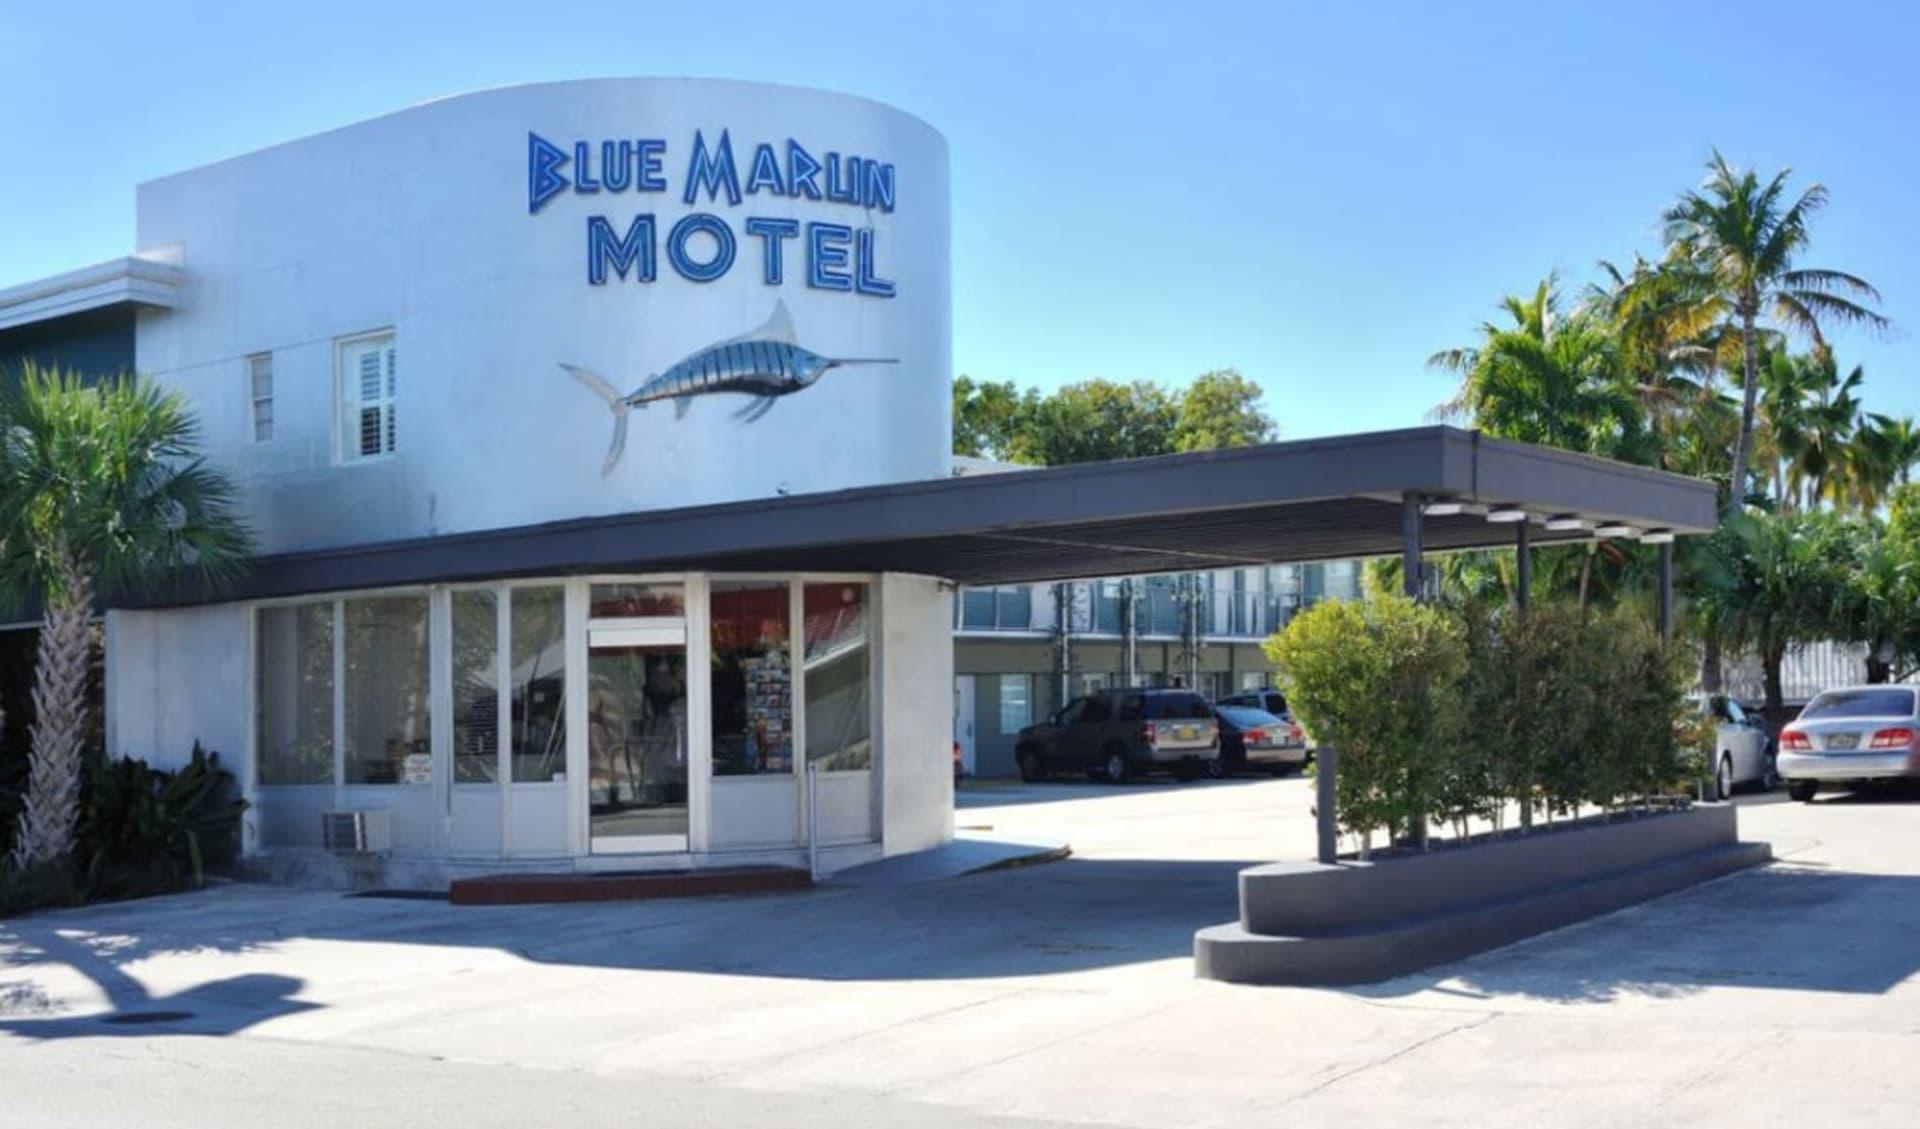 Blue Marlin Motel in Key West:  Blue Marlin Hotel_Aussenansicht